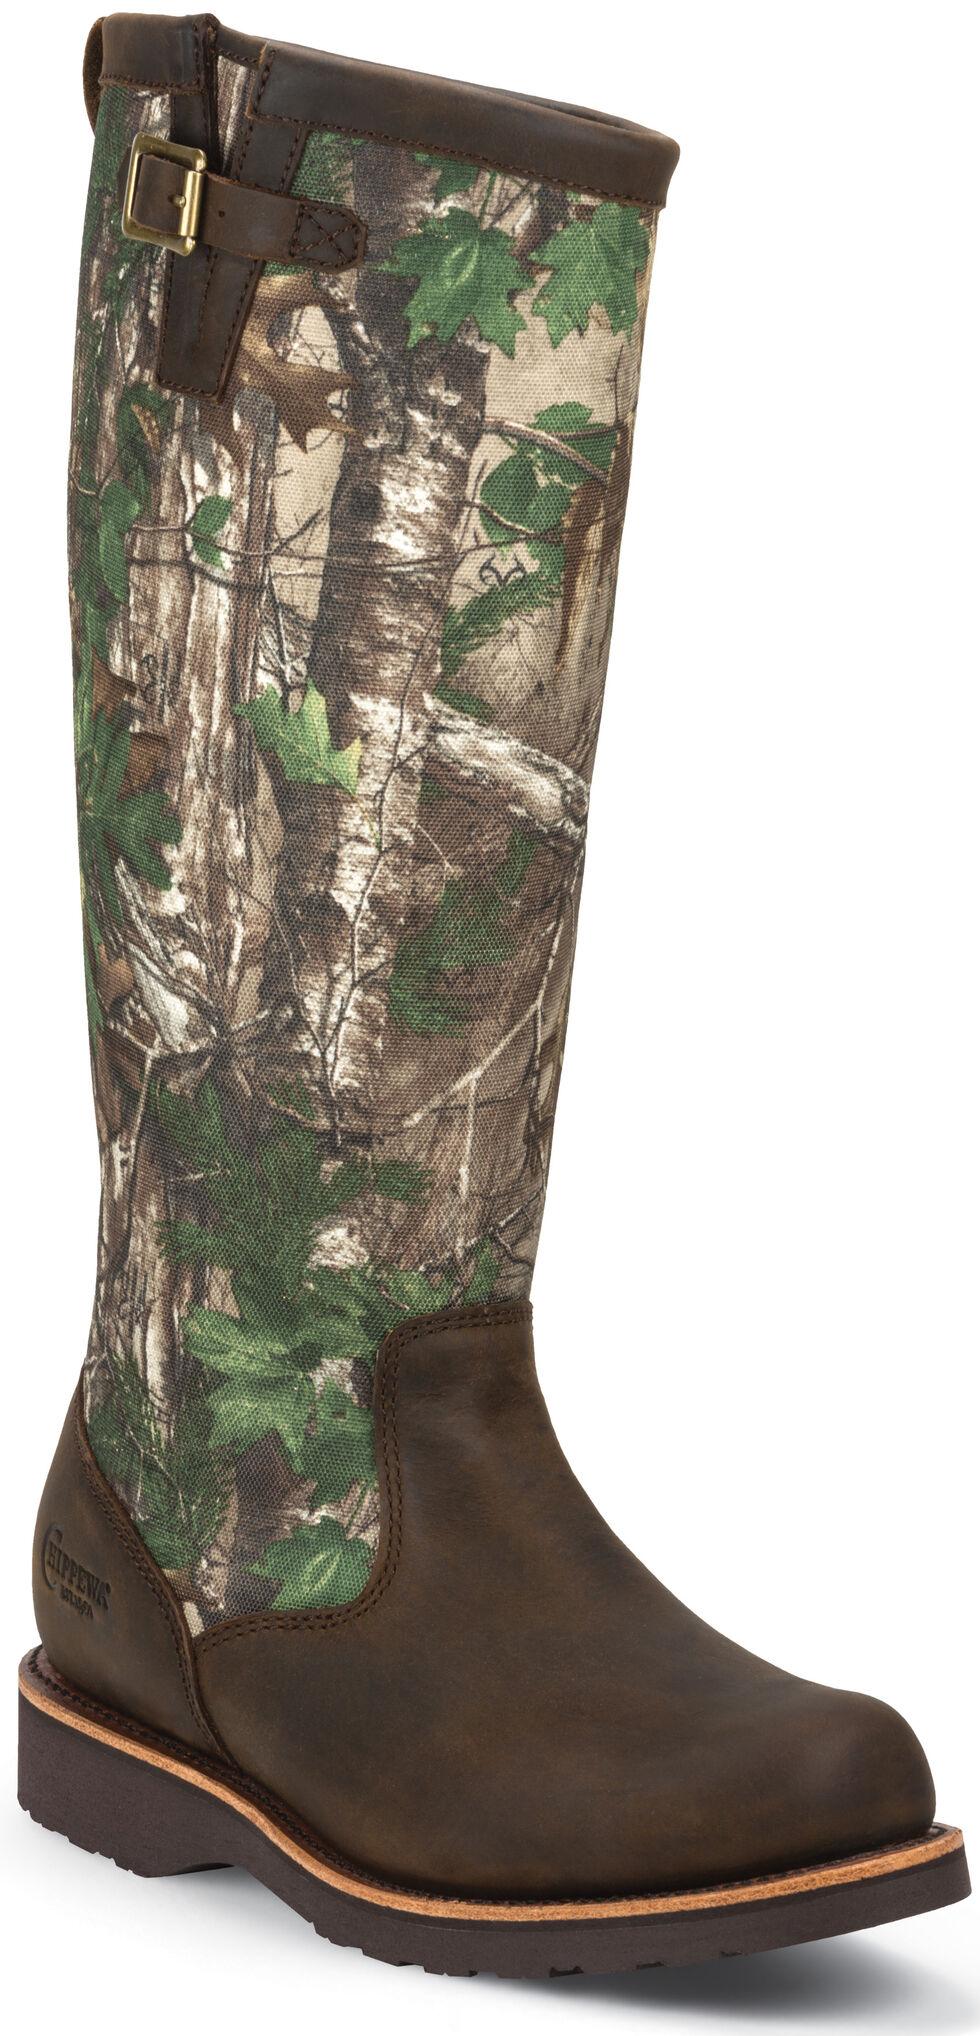 Chippewa Men's Tan Apache Snake Boots - Round Toe, Apache Tan, hi-res